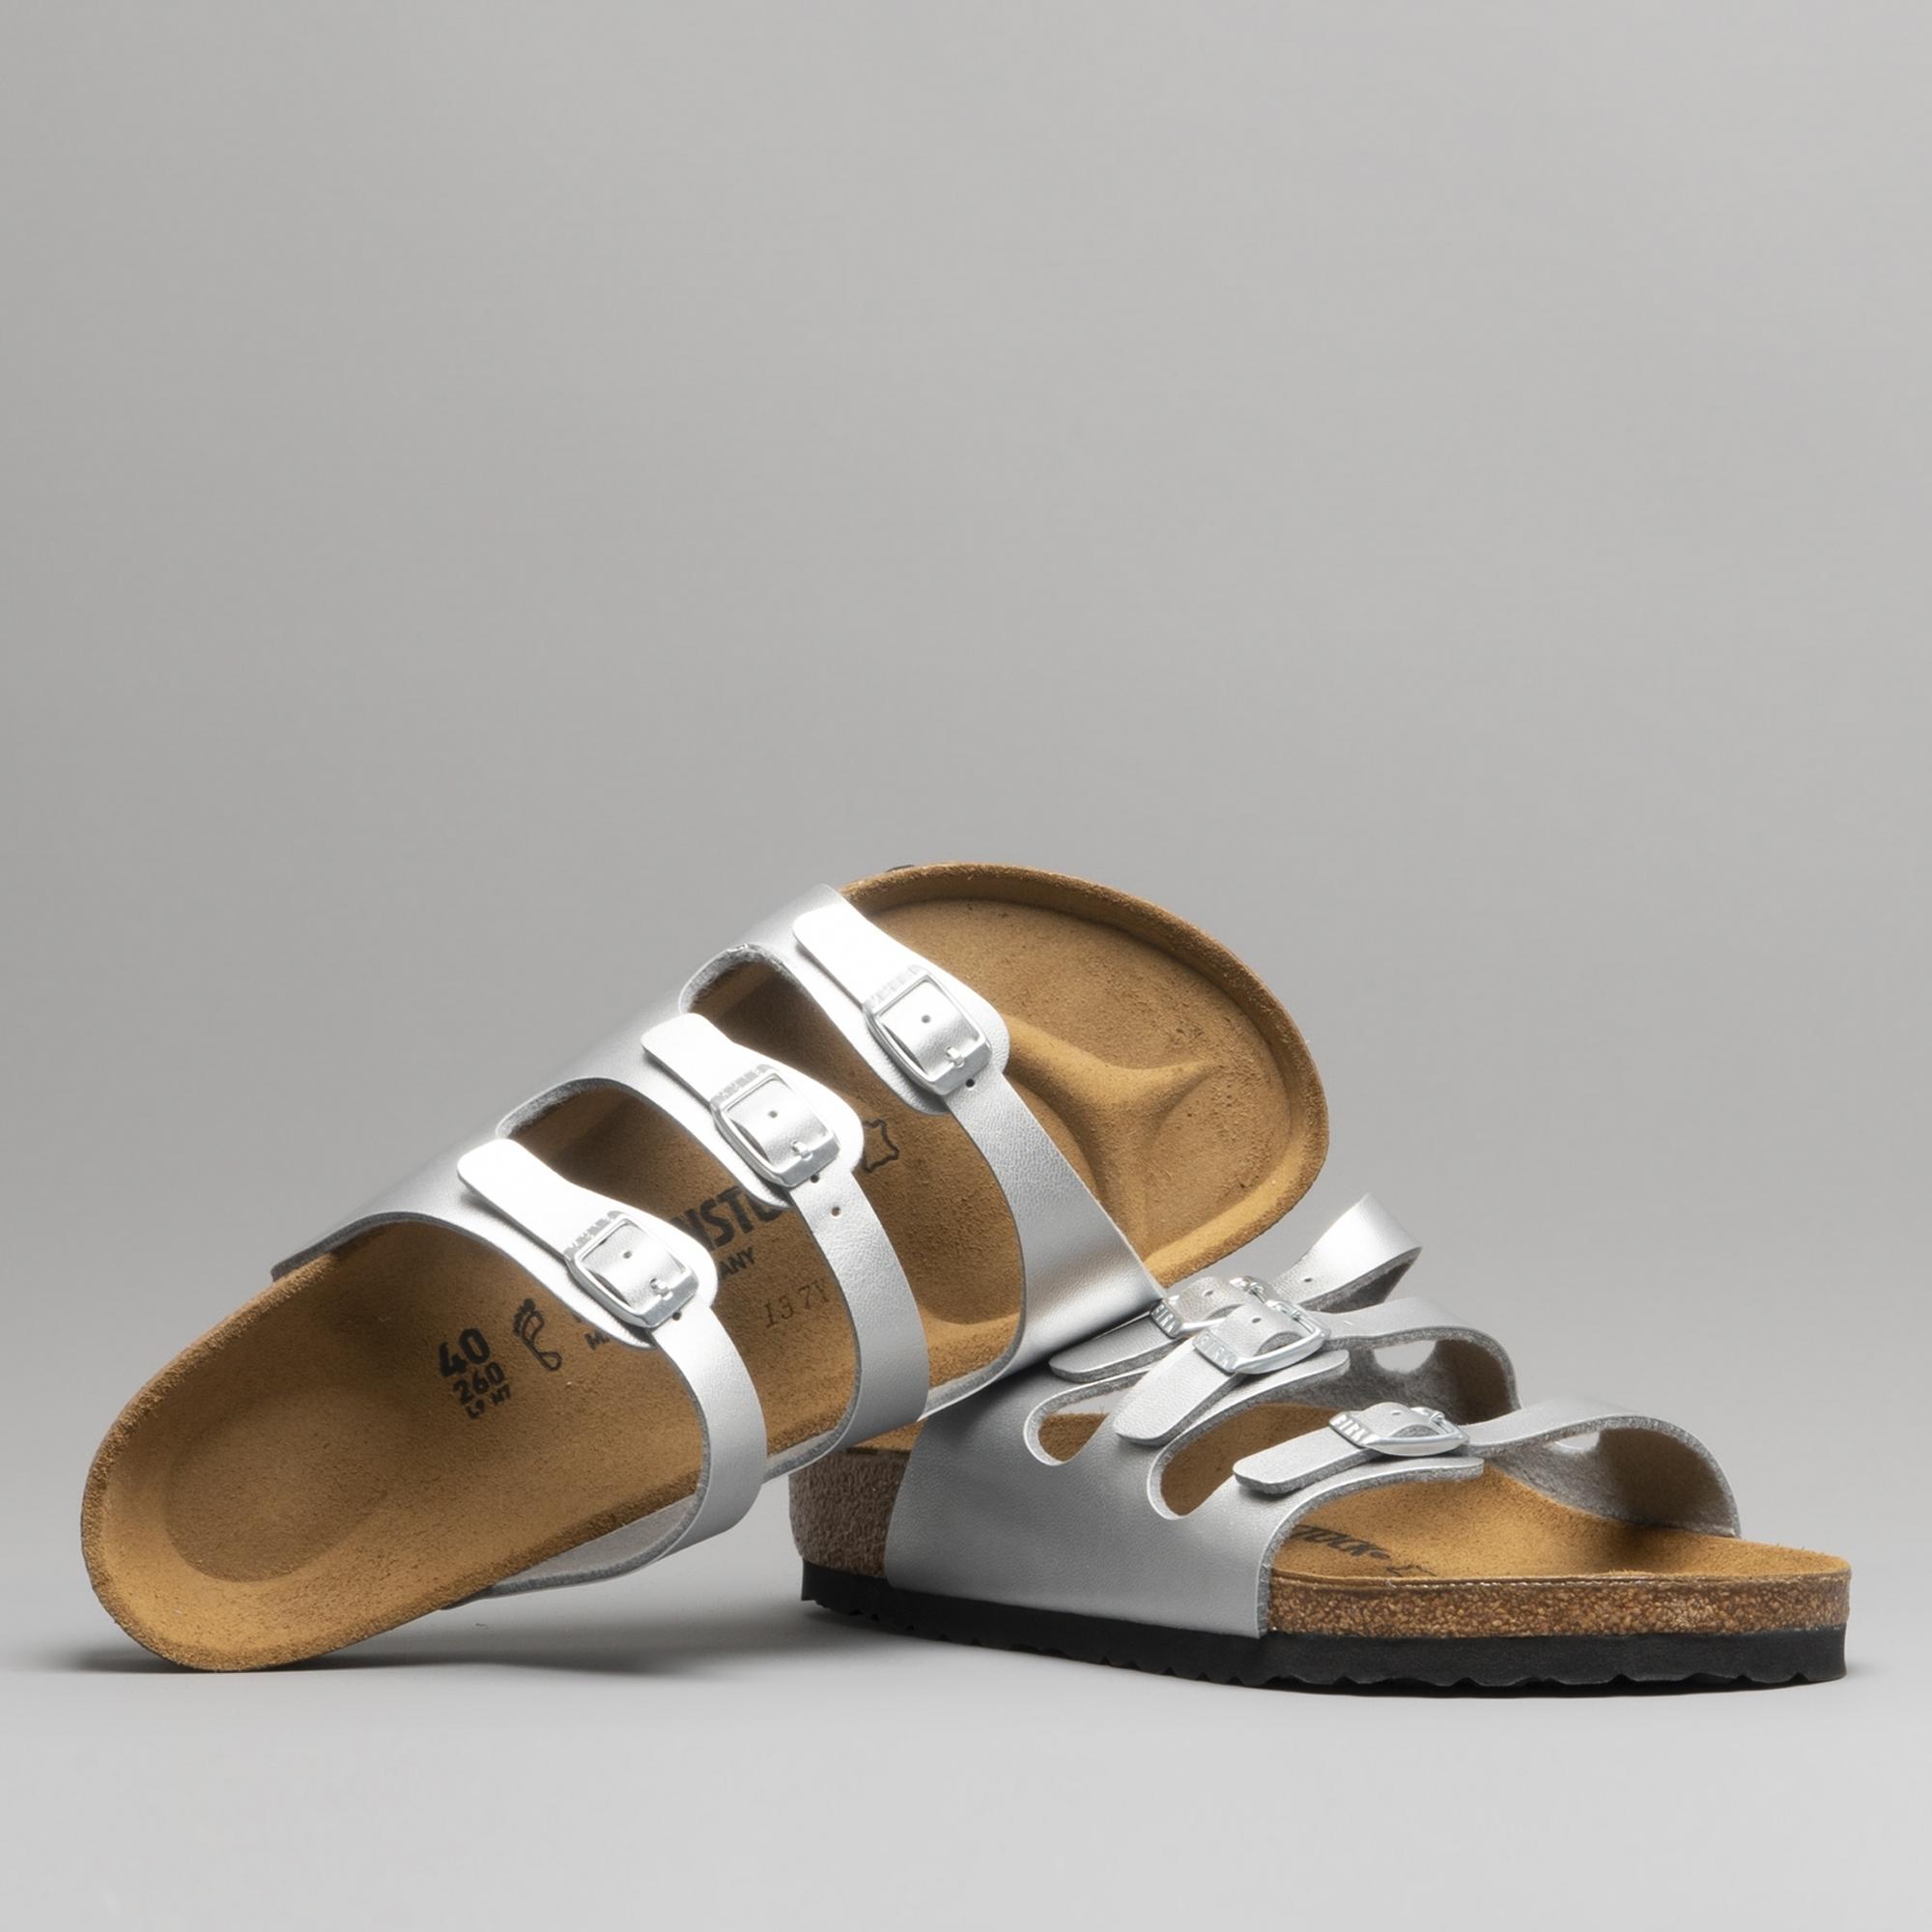 9b90416a3 Birkenstock FLORIDA 954381 Ladies Three Strap Sandals Silver